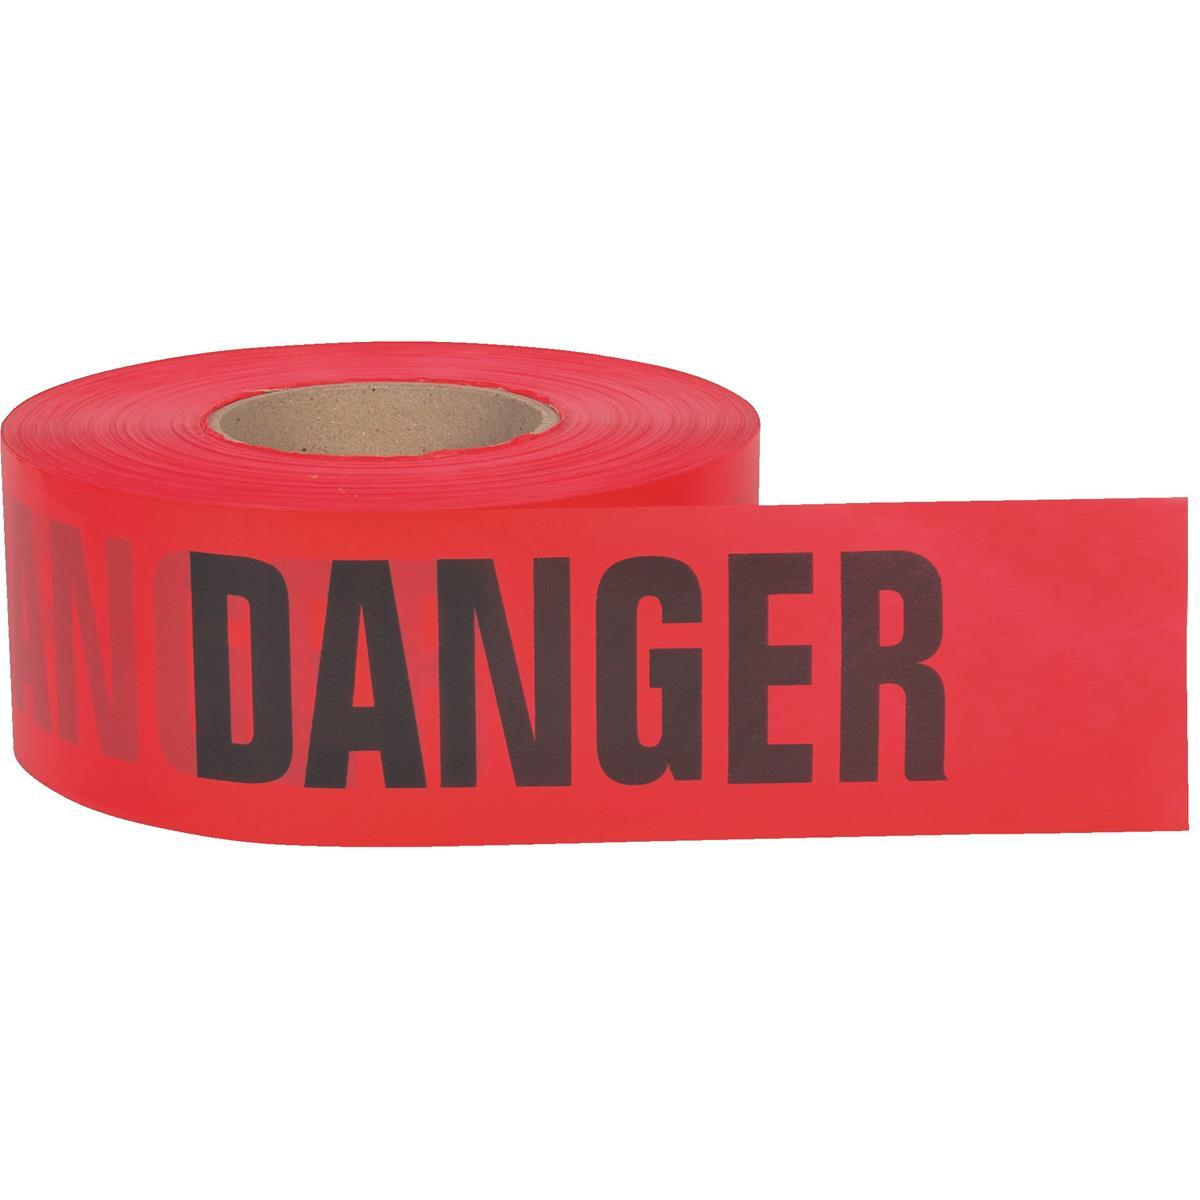 English/Spanish Danger Tape 1.5ML